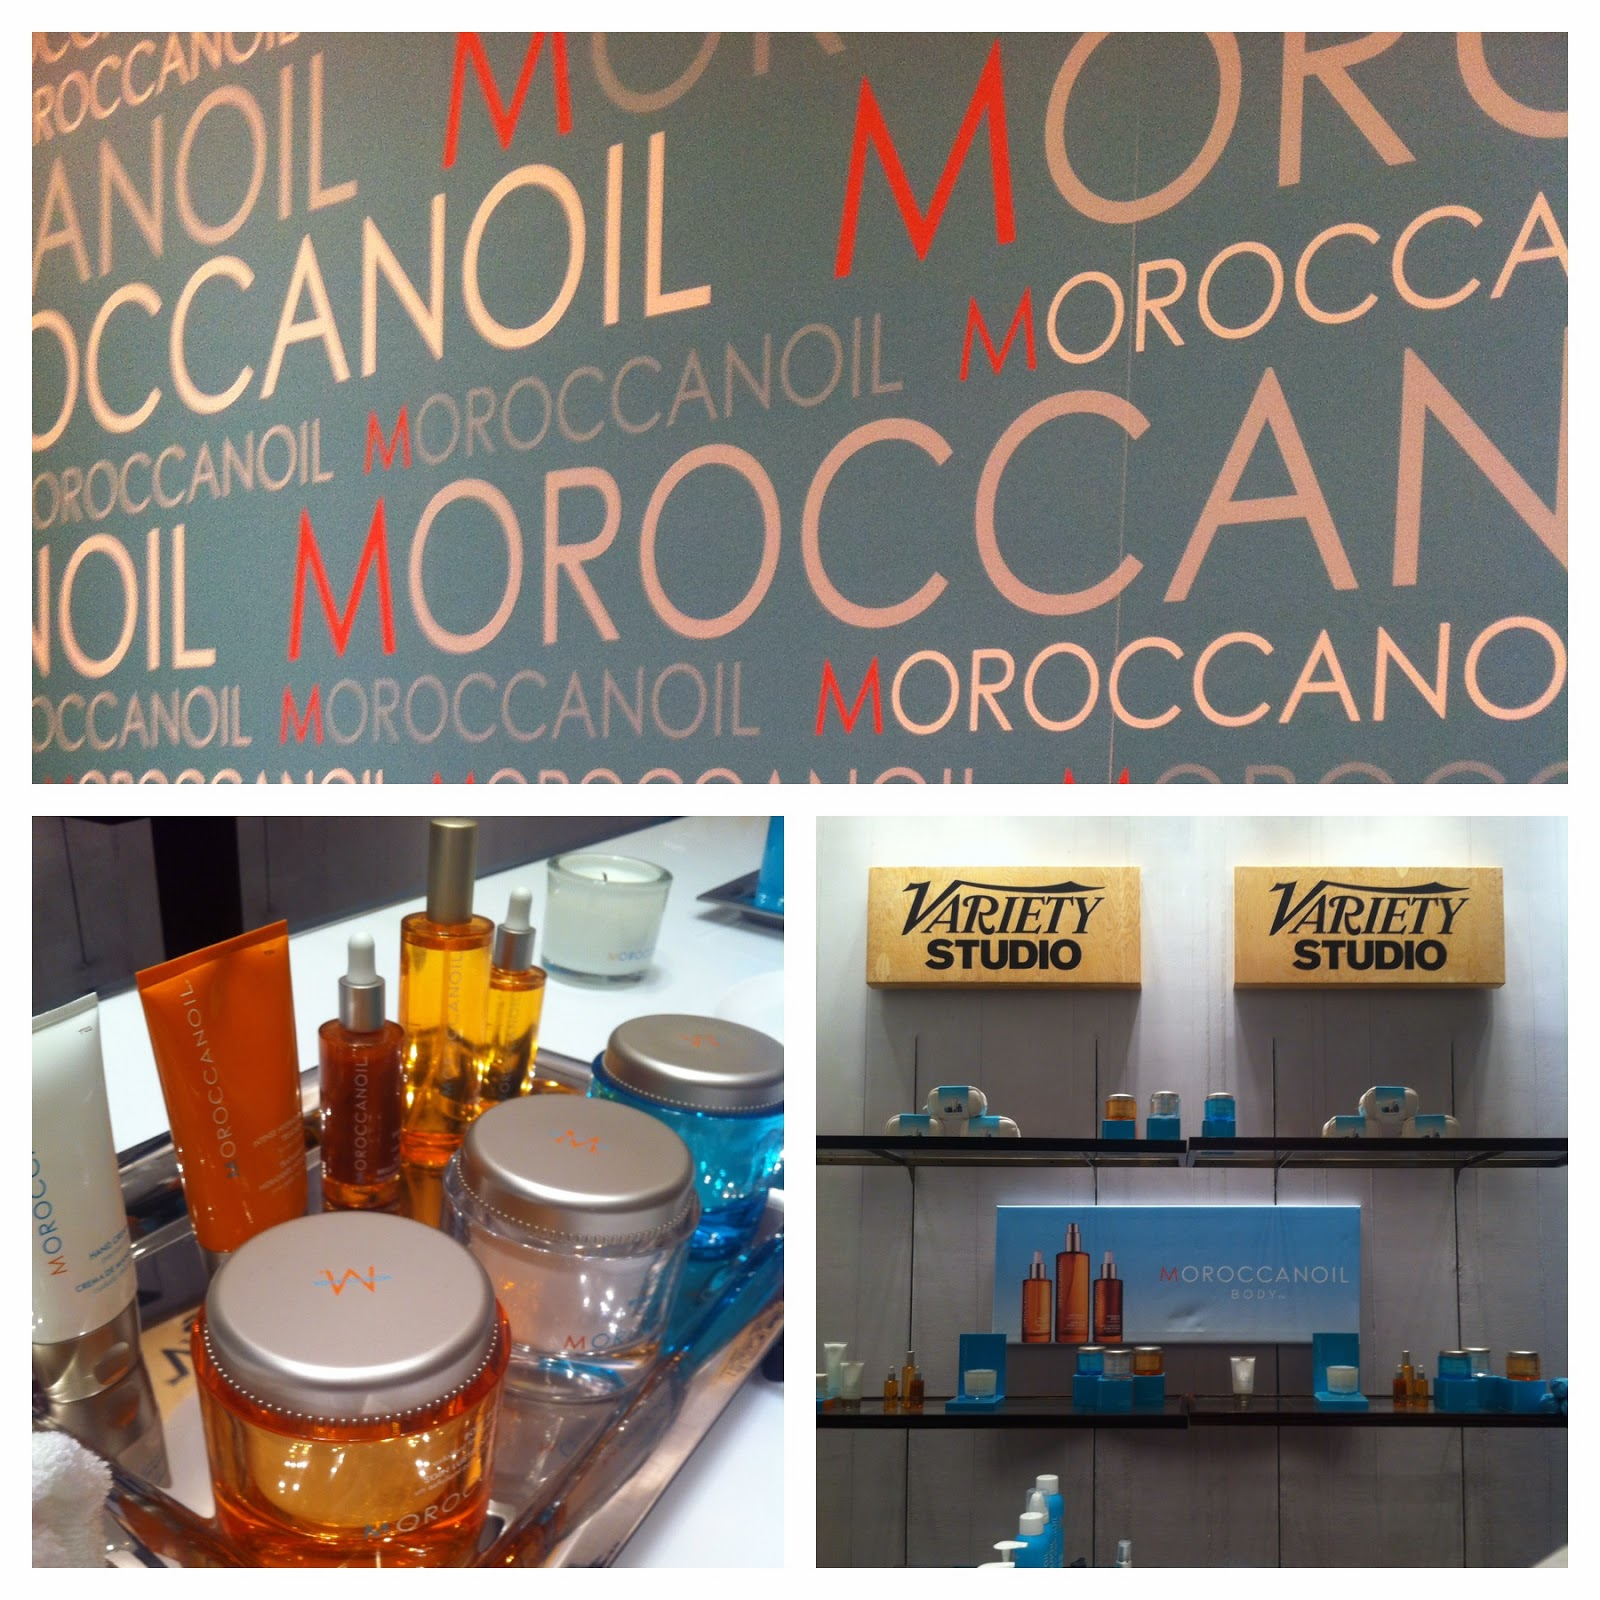 TIFF Beauty, TIFF 2014, Moroccanoil, Moroccanoil  Hair, Moroccanoil Body, Moroccanoil Review, Variety Magazine